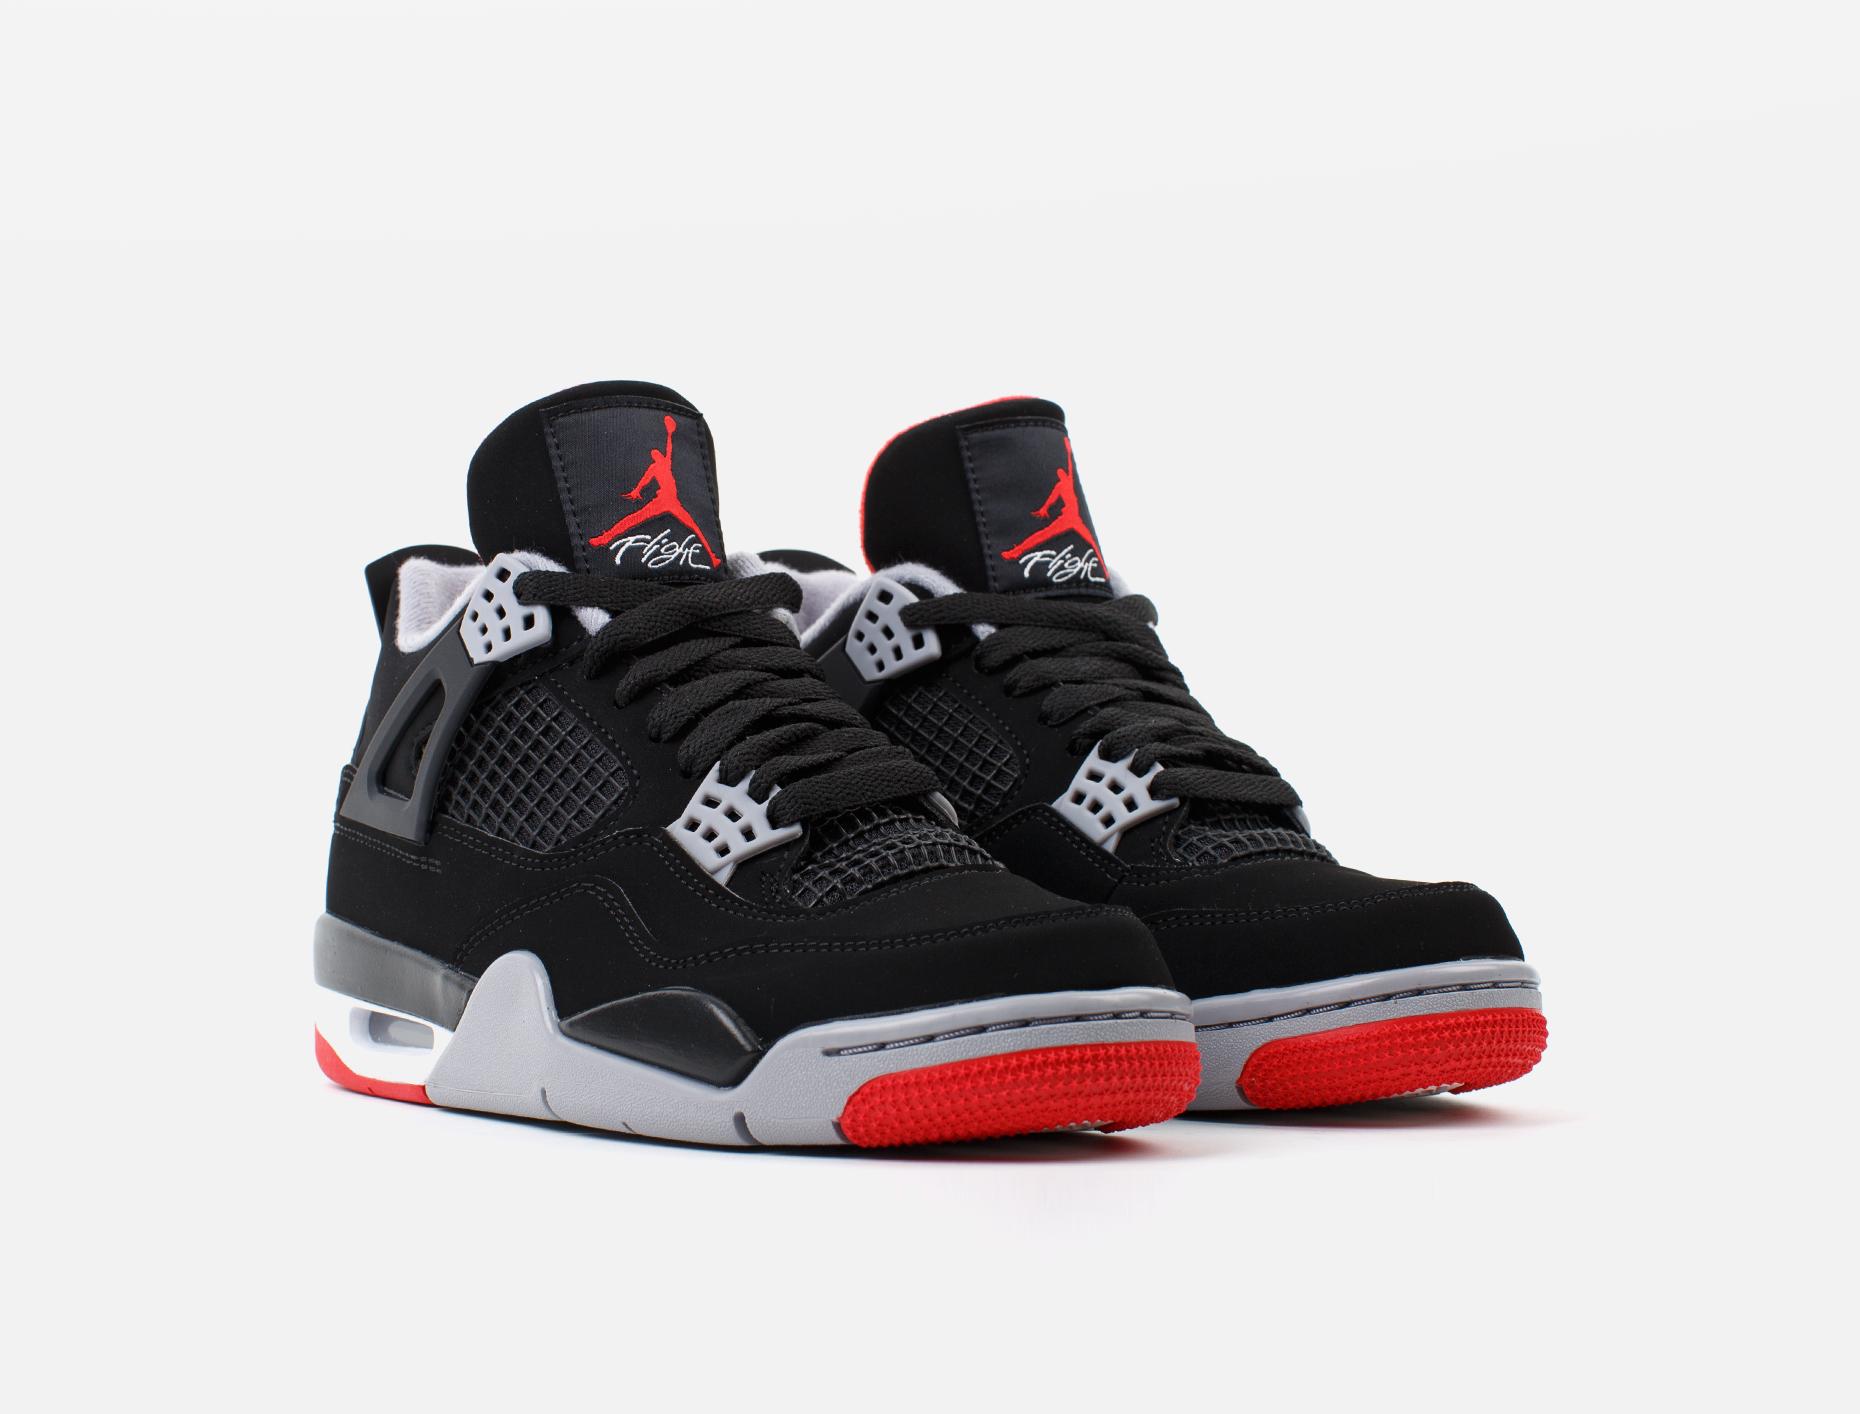 size 40 aeb29 169bf ... Preview  Air Jordan 4 Retro Sneaker ...